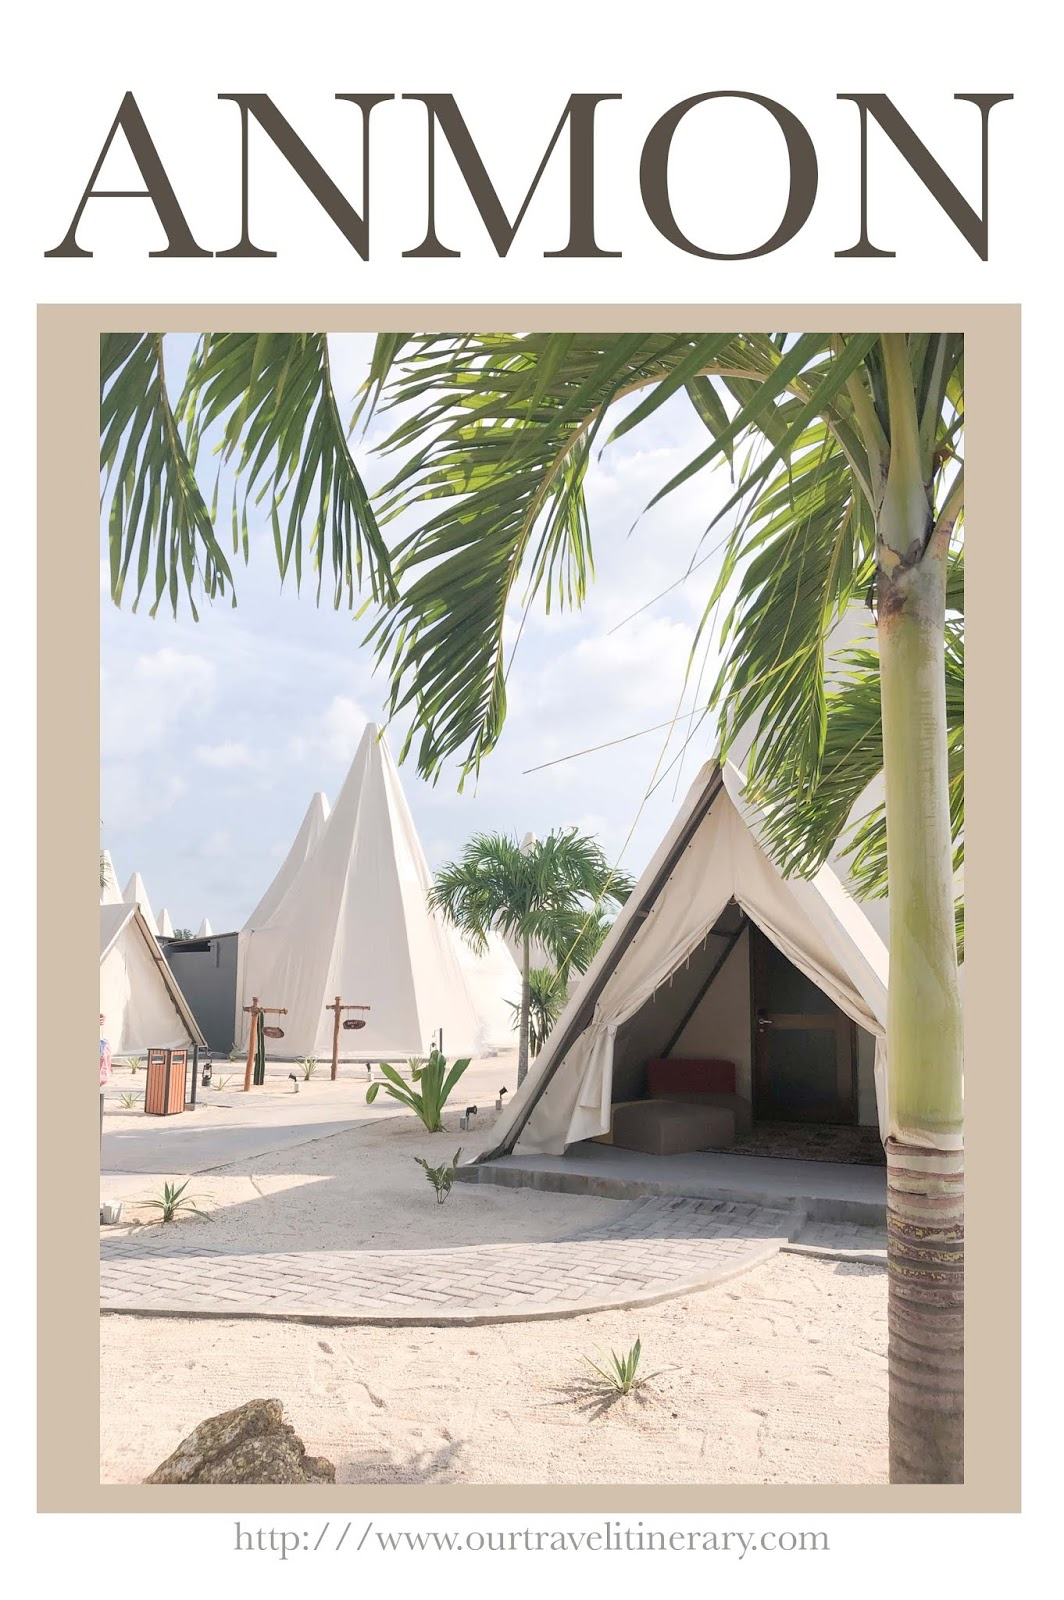 Indonesia bintan, things to do in bintan, bintan itinerary, Anmon resort review, Anmon itinerary, Anmon glamping, bintan glamping review, weekend bintan, treasure bay, treasure bay review, treasure bay, amnon review, bintan resort review, bintan resort